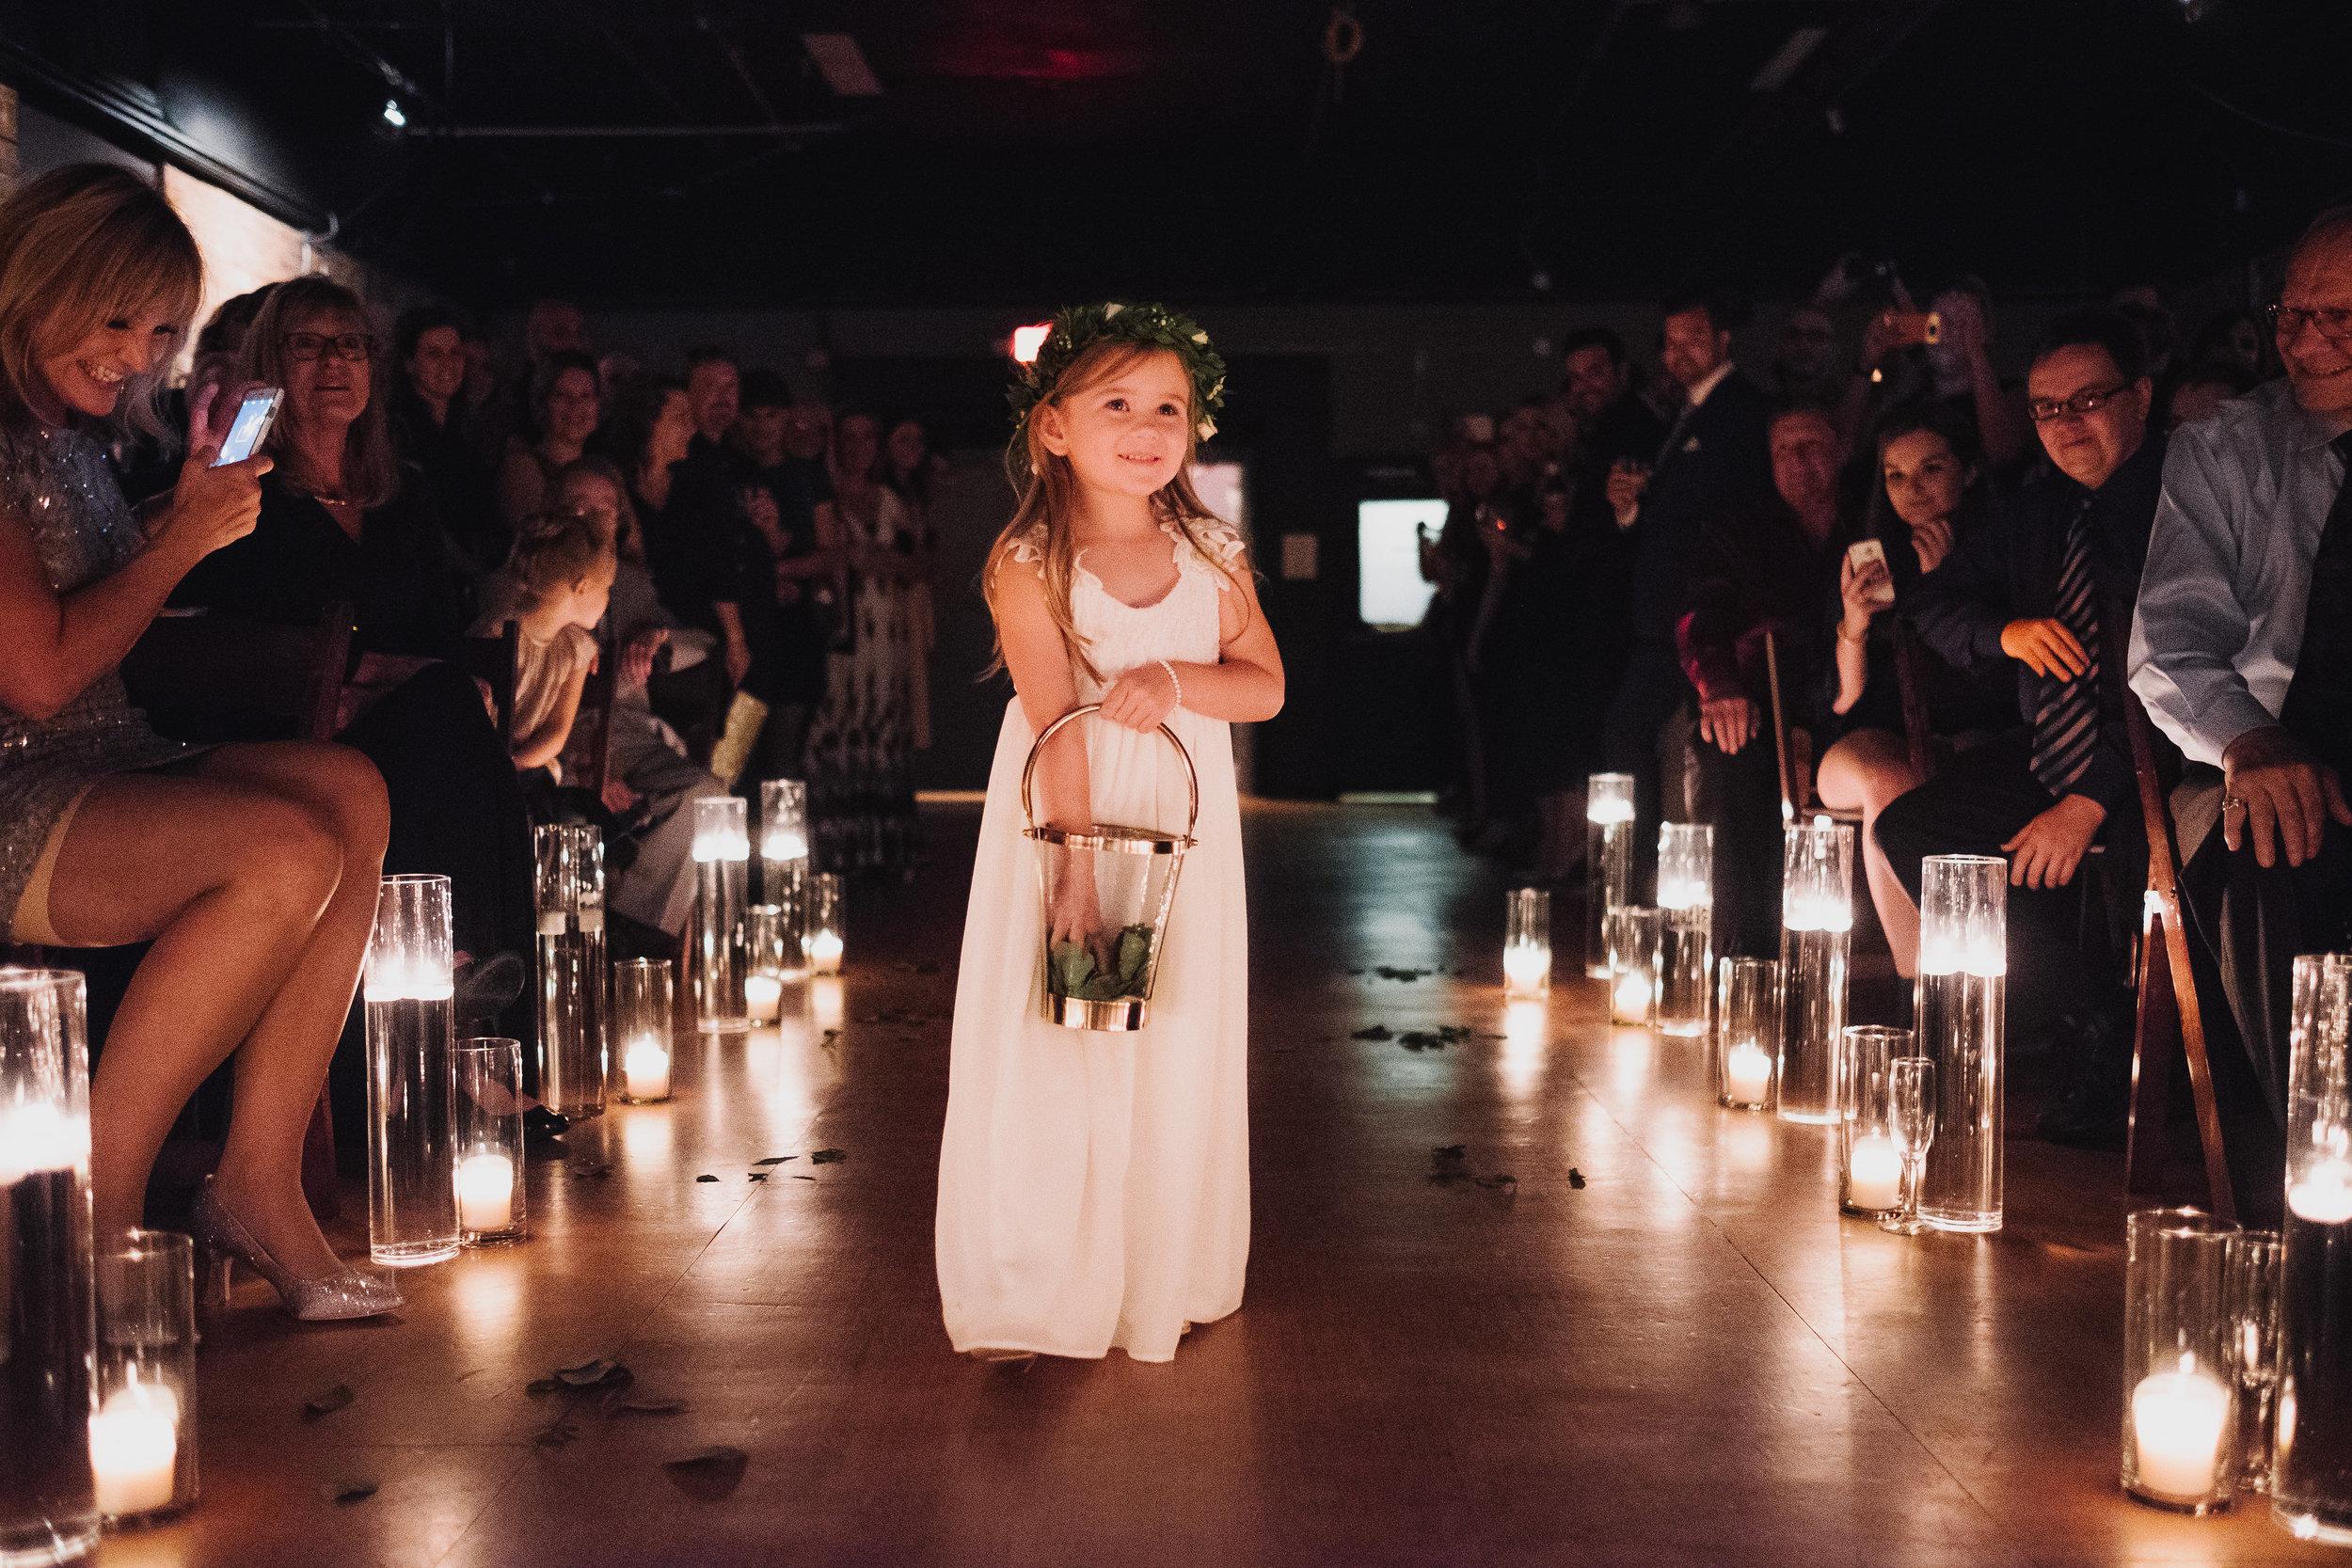 Danika-Mike-Veerman-Wedding-Spice-Factory-Hamilton-INLY-Events-TJ-Tindale-382.jpg